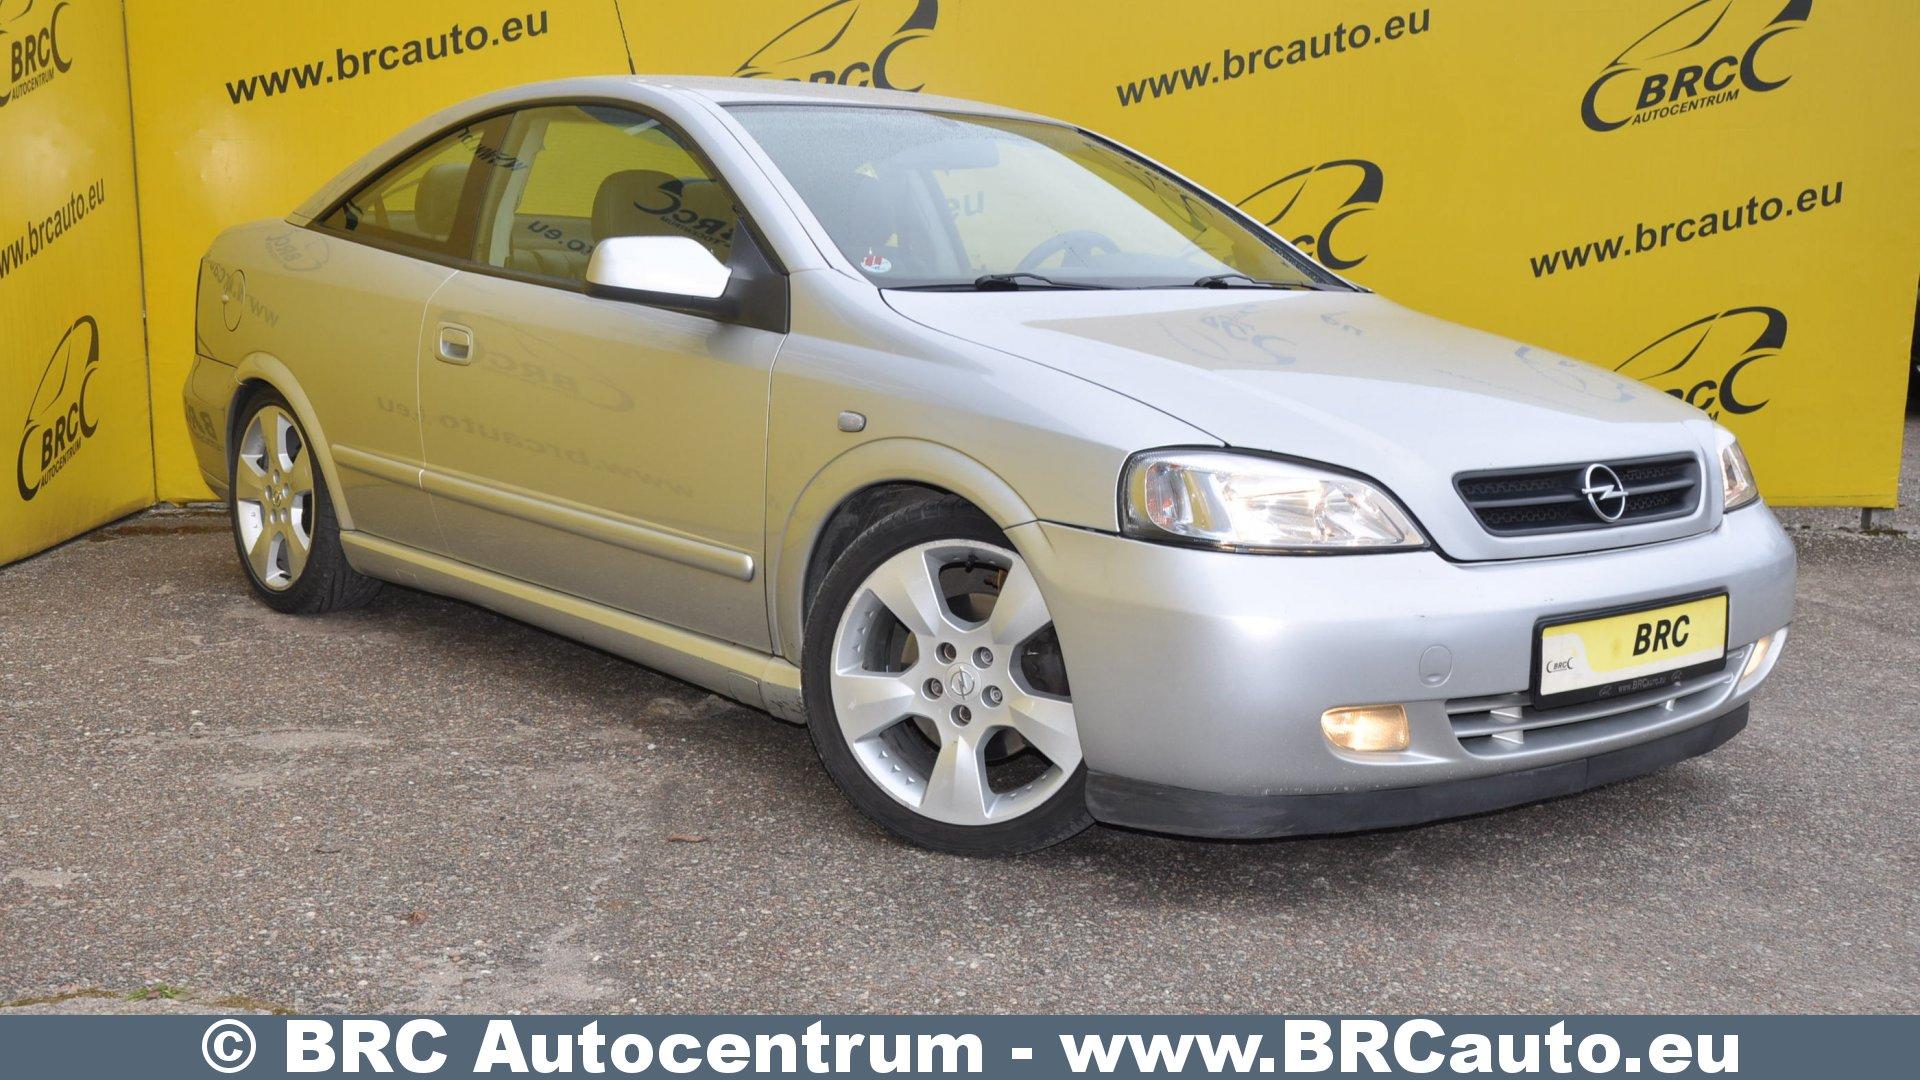 Opel Astra 2.2 Bertone Automatas